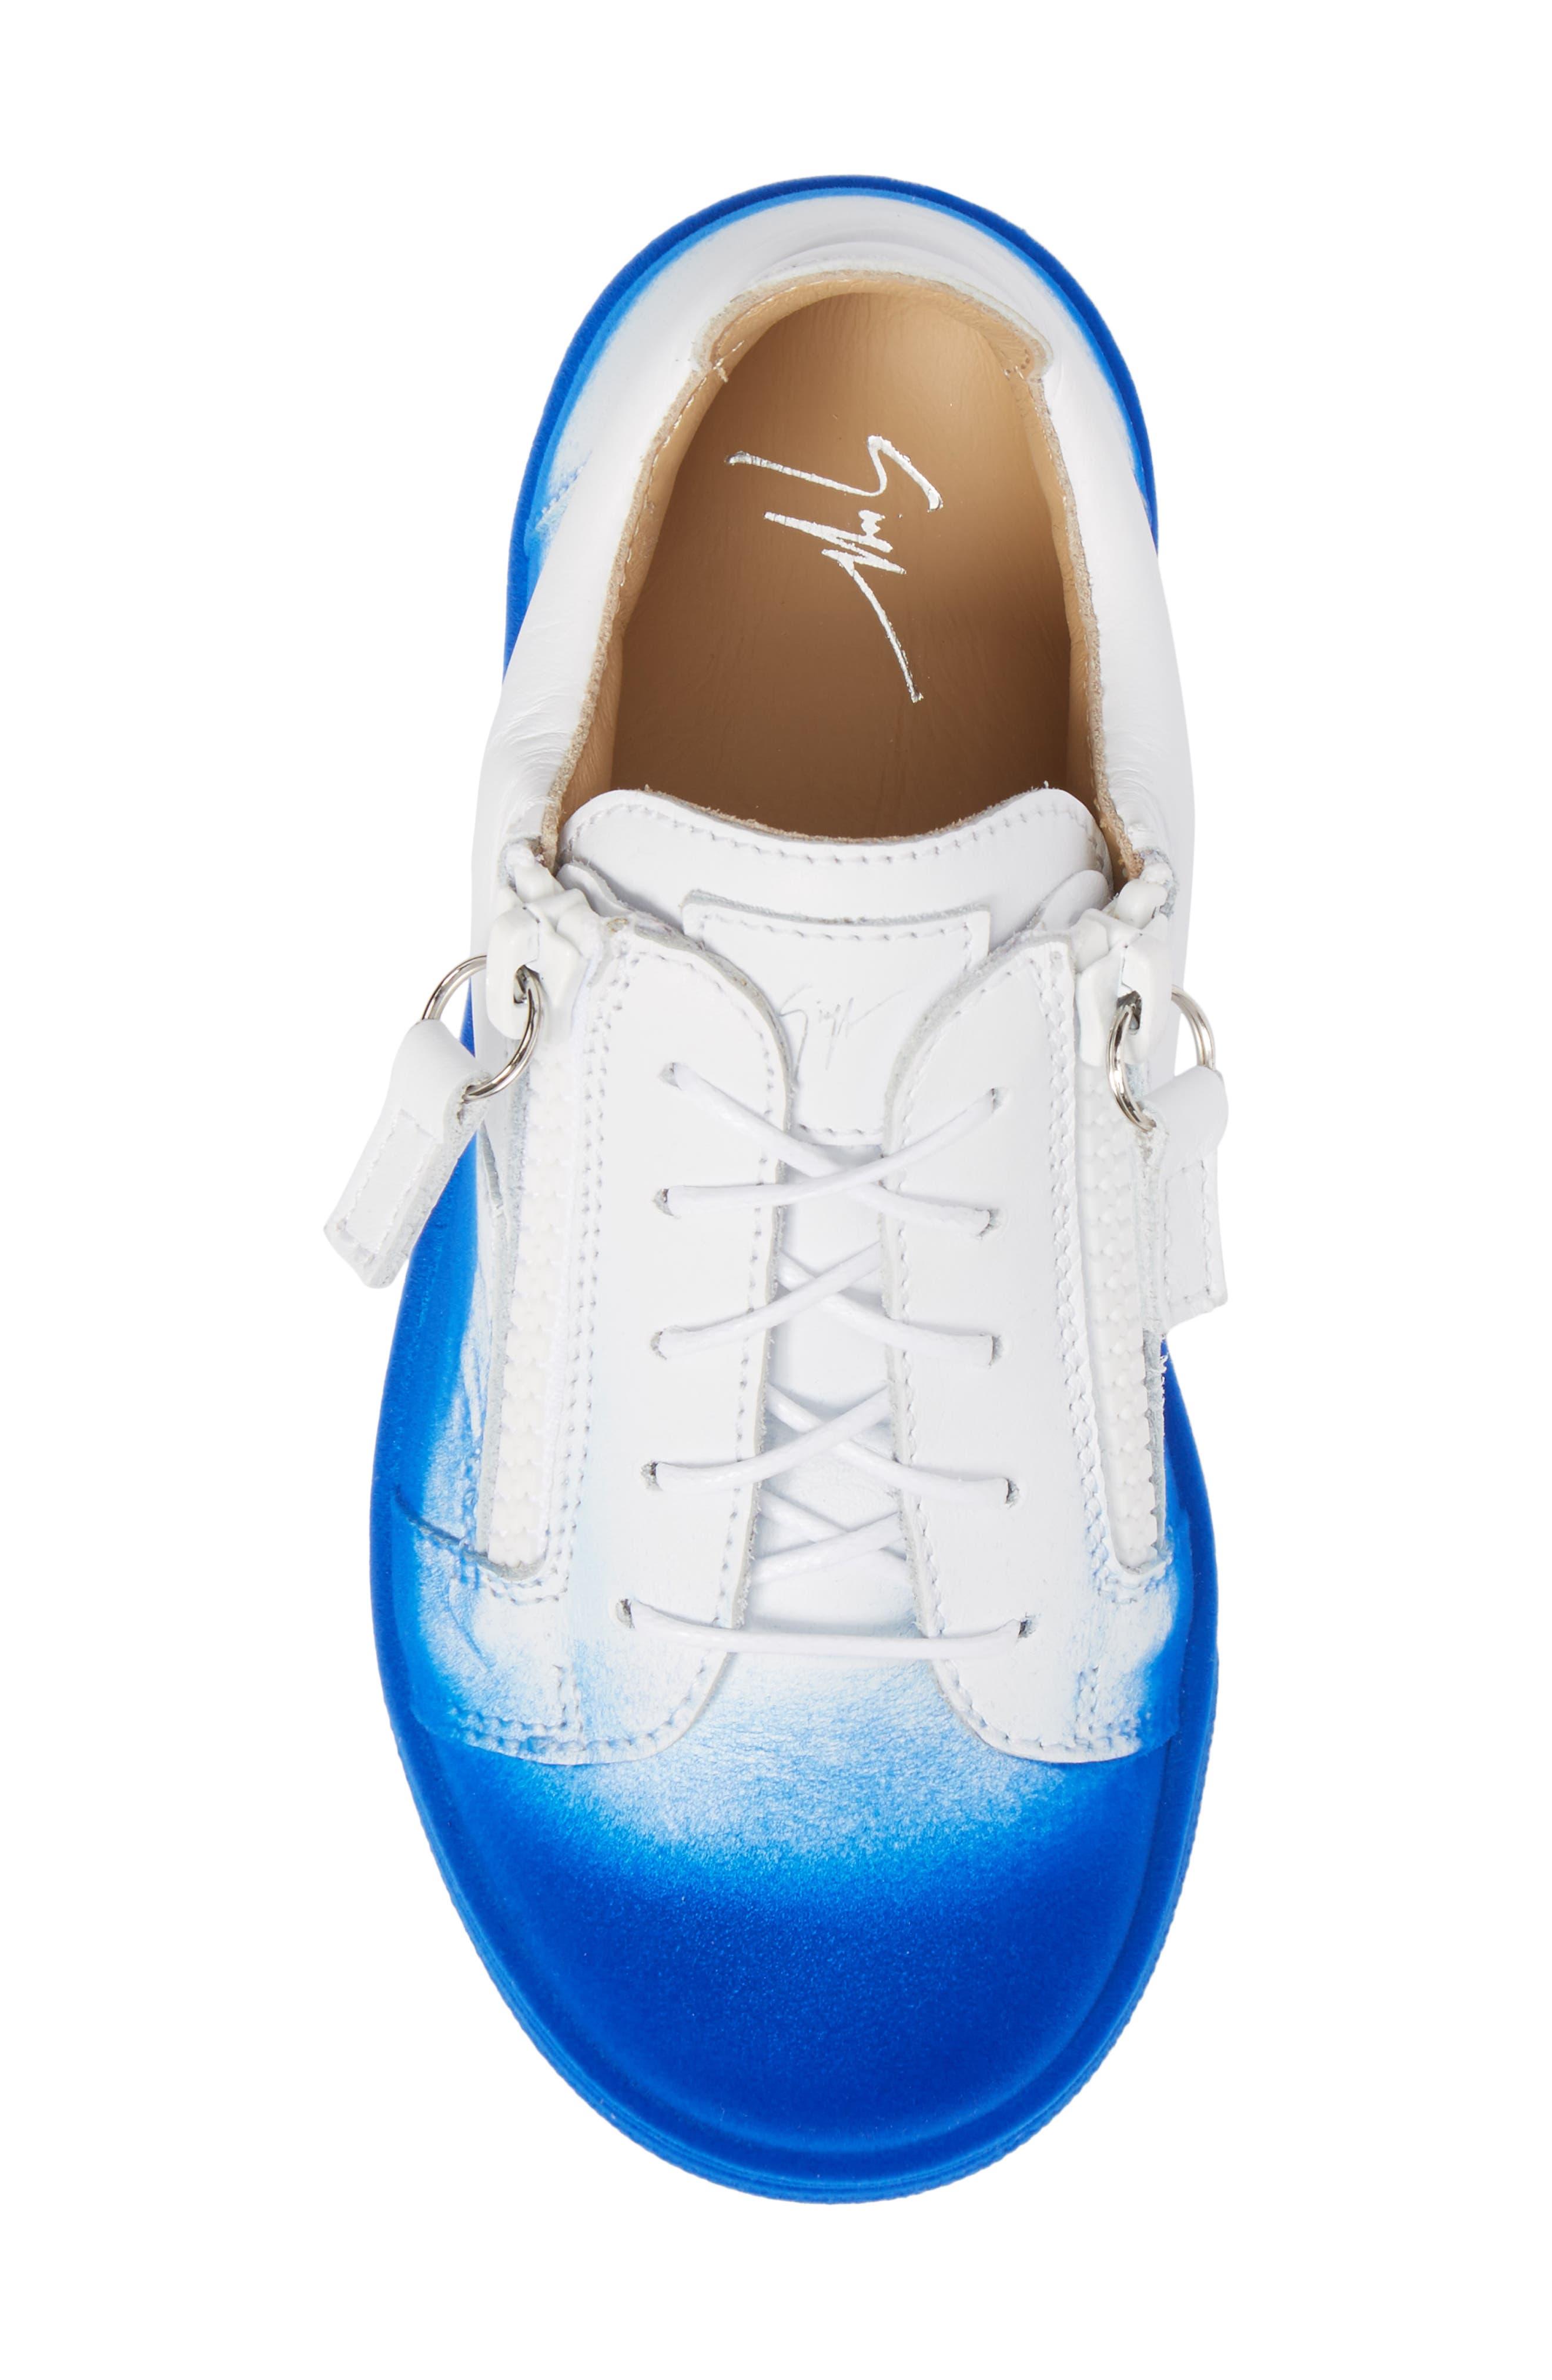 Smuggy Ombré Flocked Sneaker,                             Alternate thumbnail 5, color,                             BLUE/ WHITE